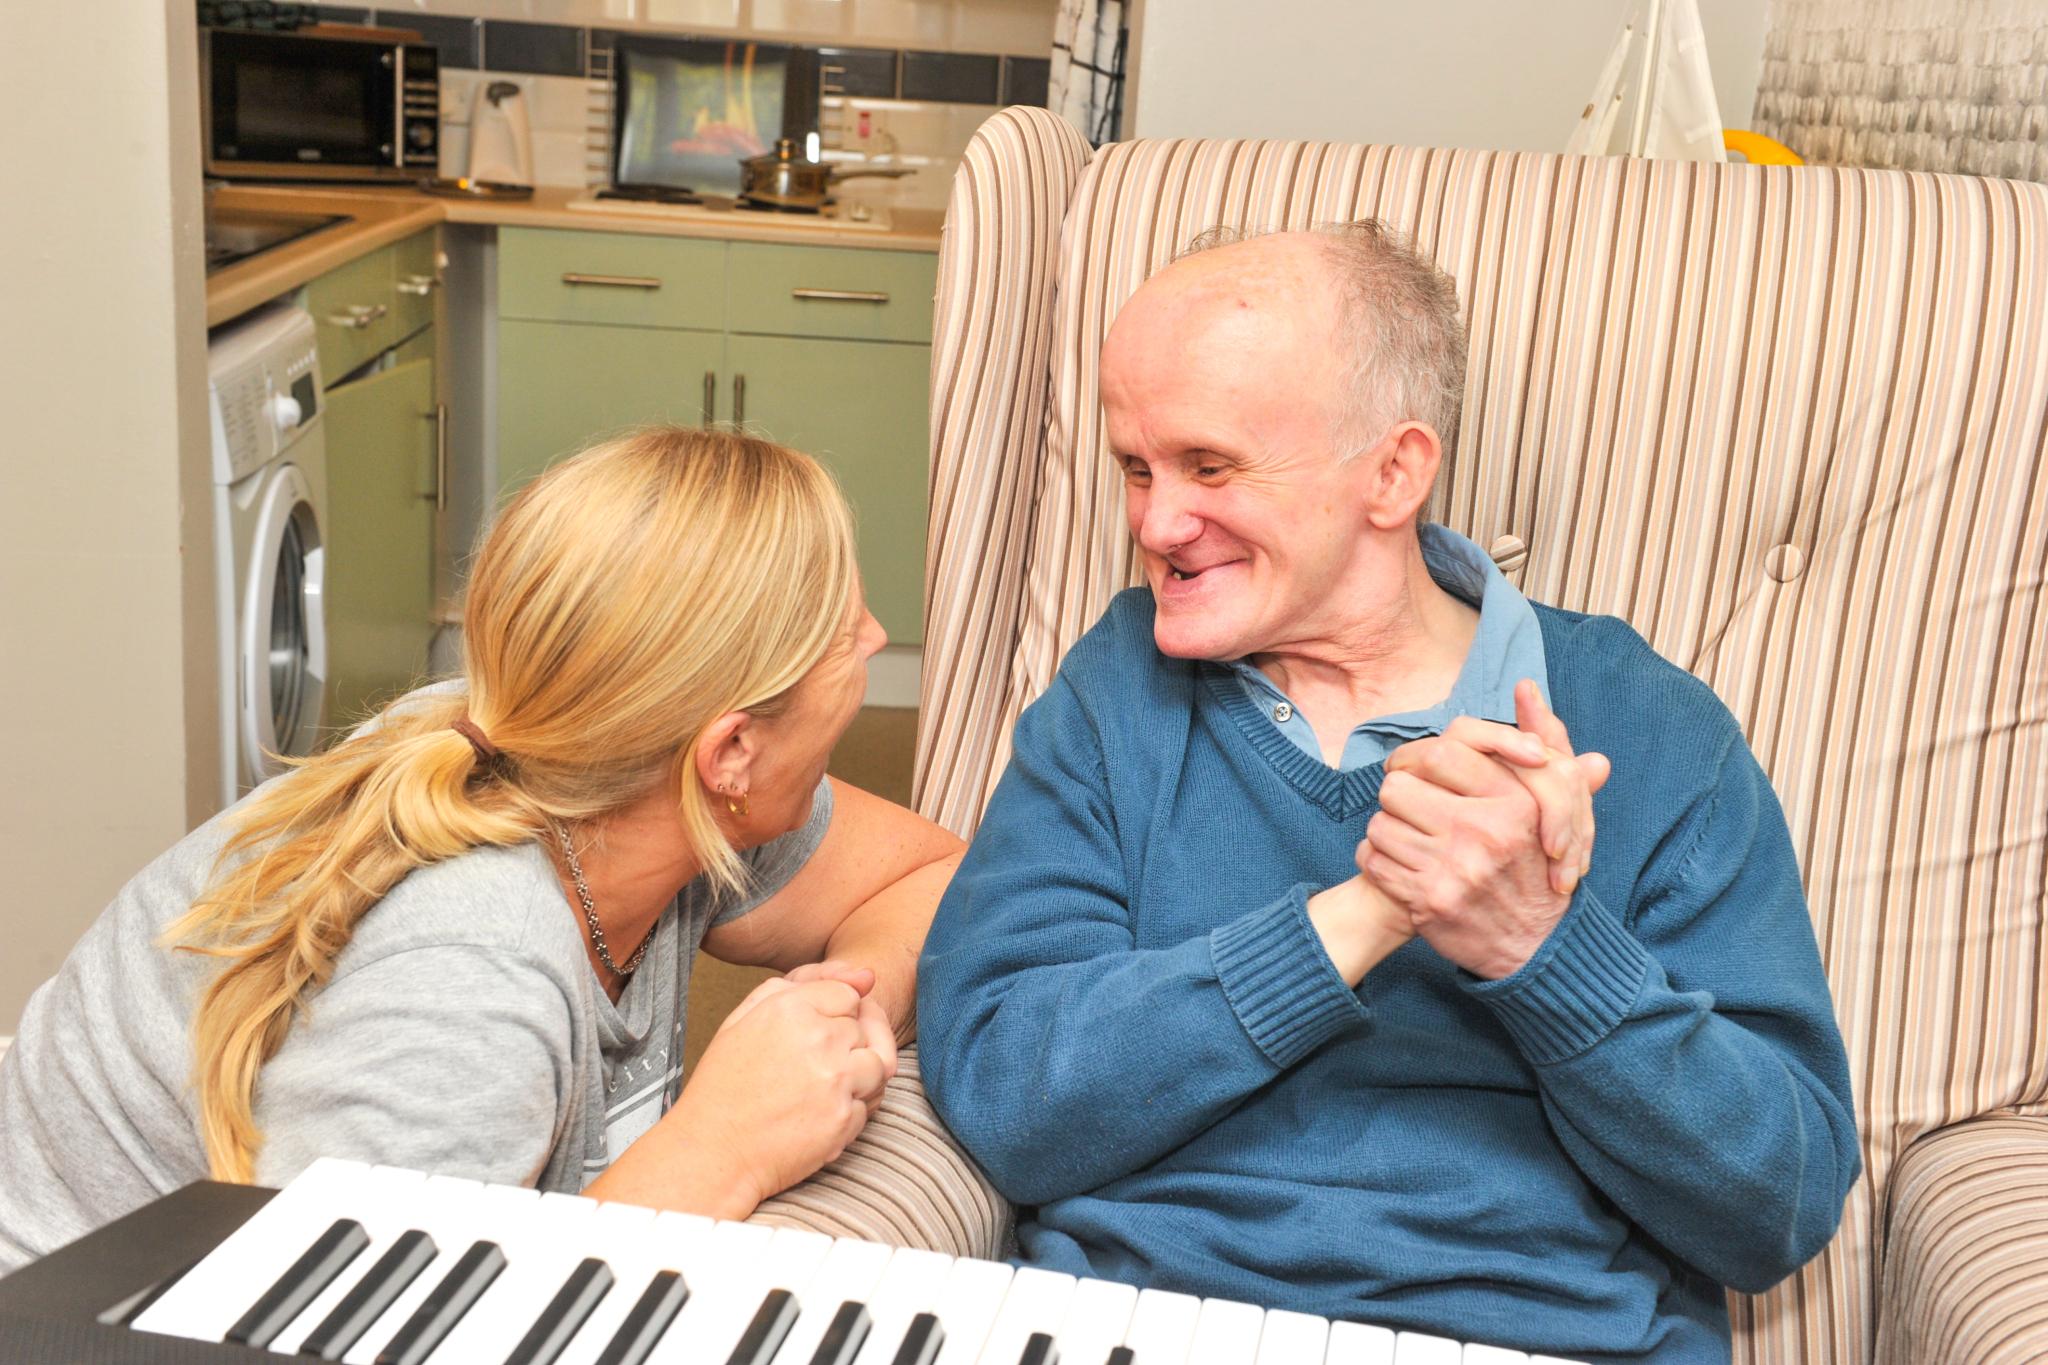 Portsmouth solent lifeways kestrel centre partnership supported living